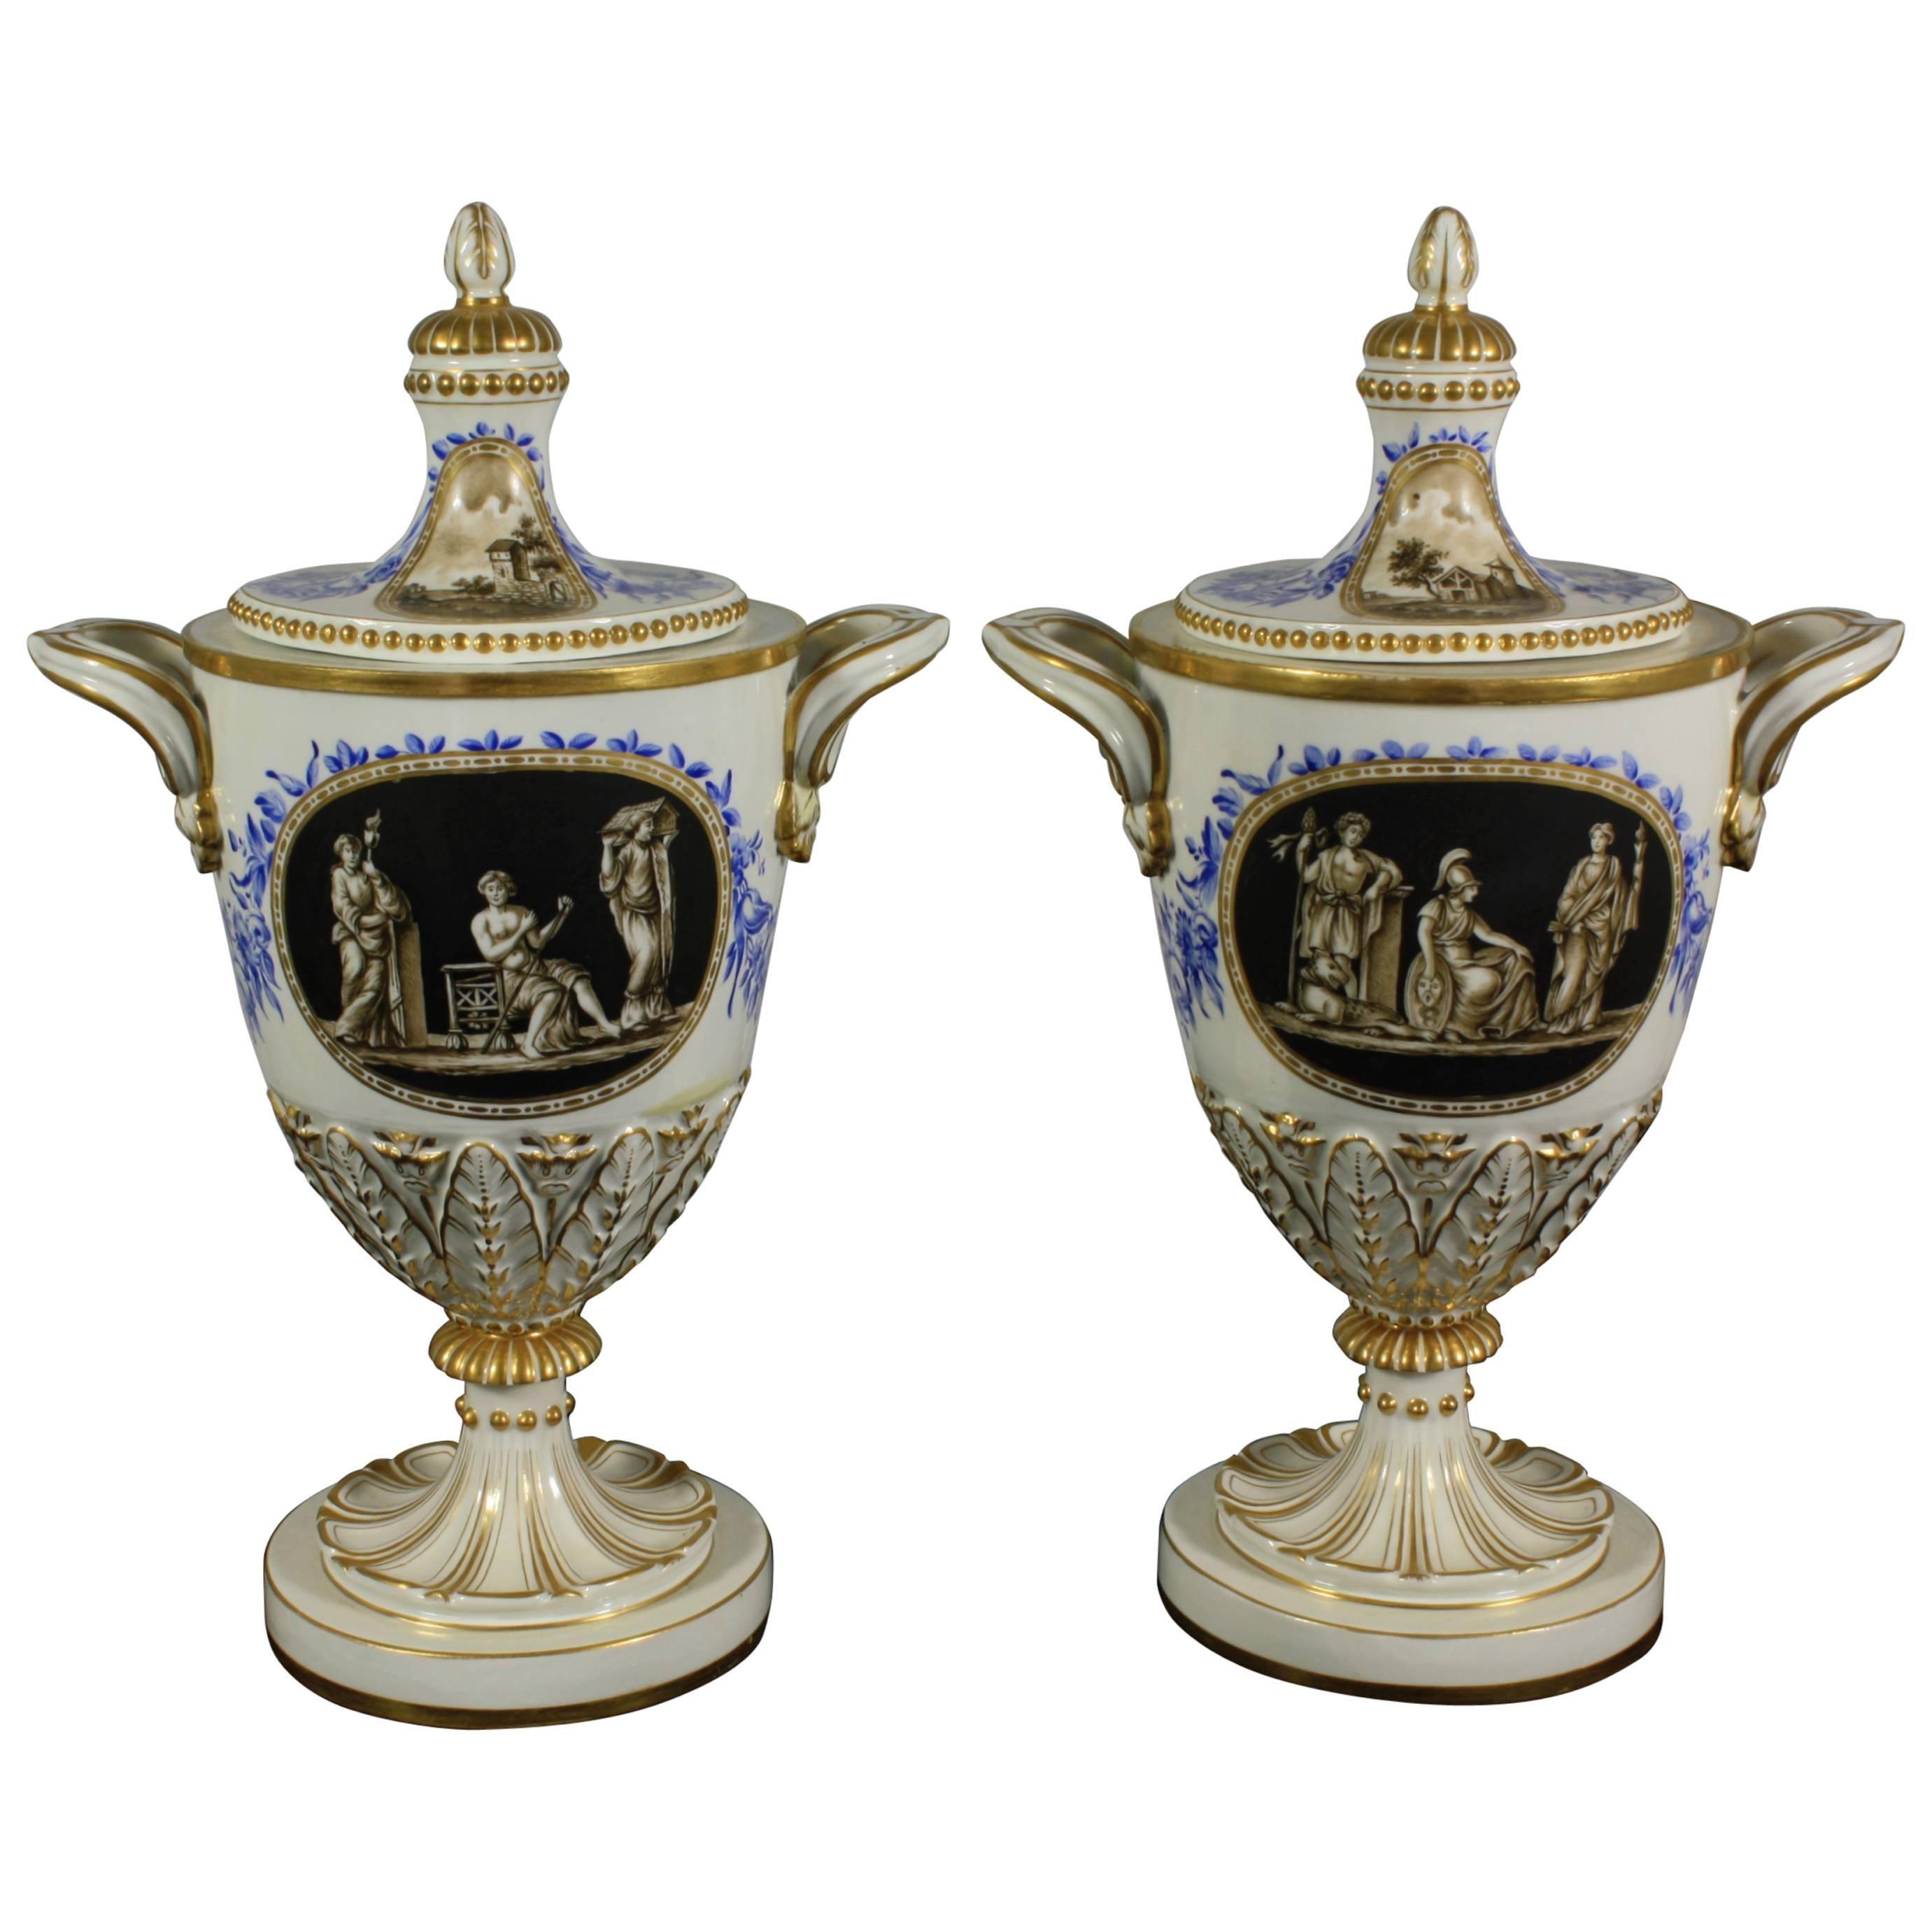 Pair of Neoclassical Italian Lidded Urns